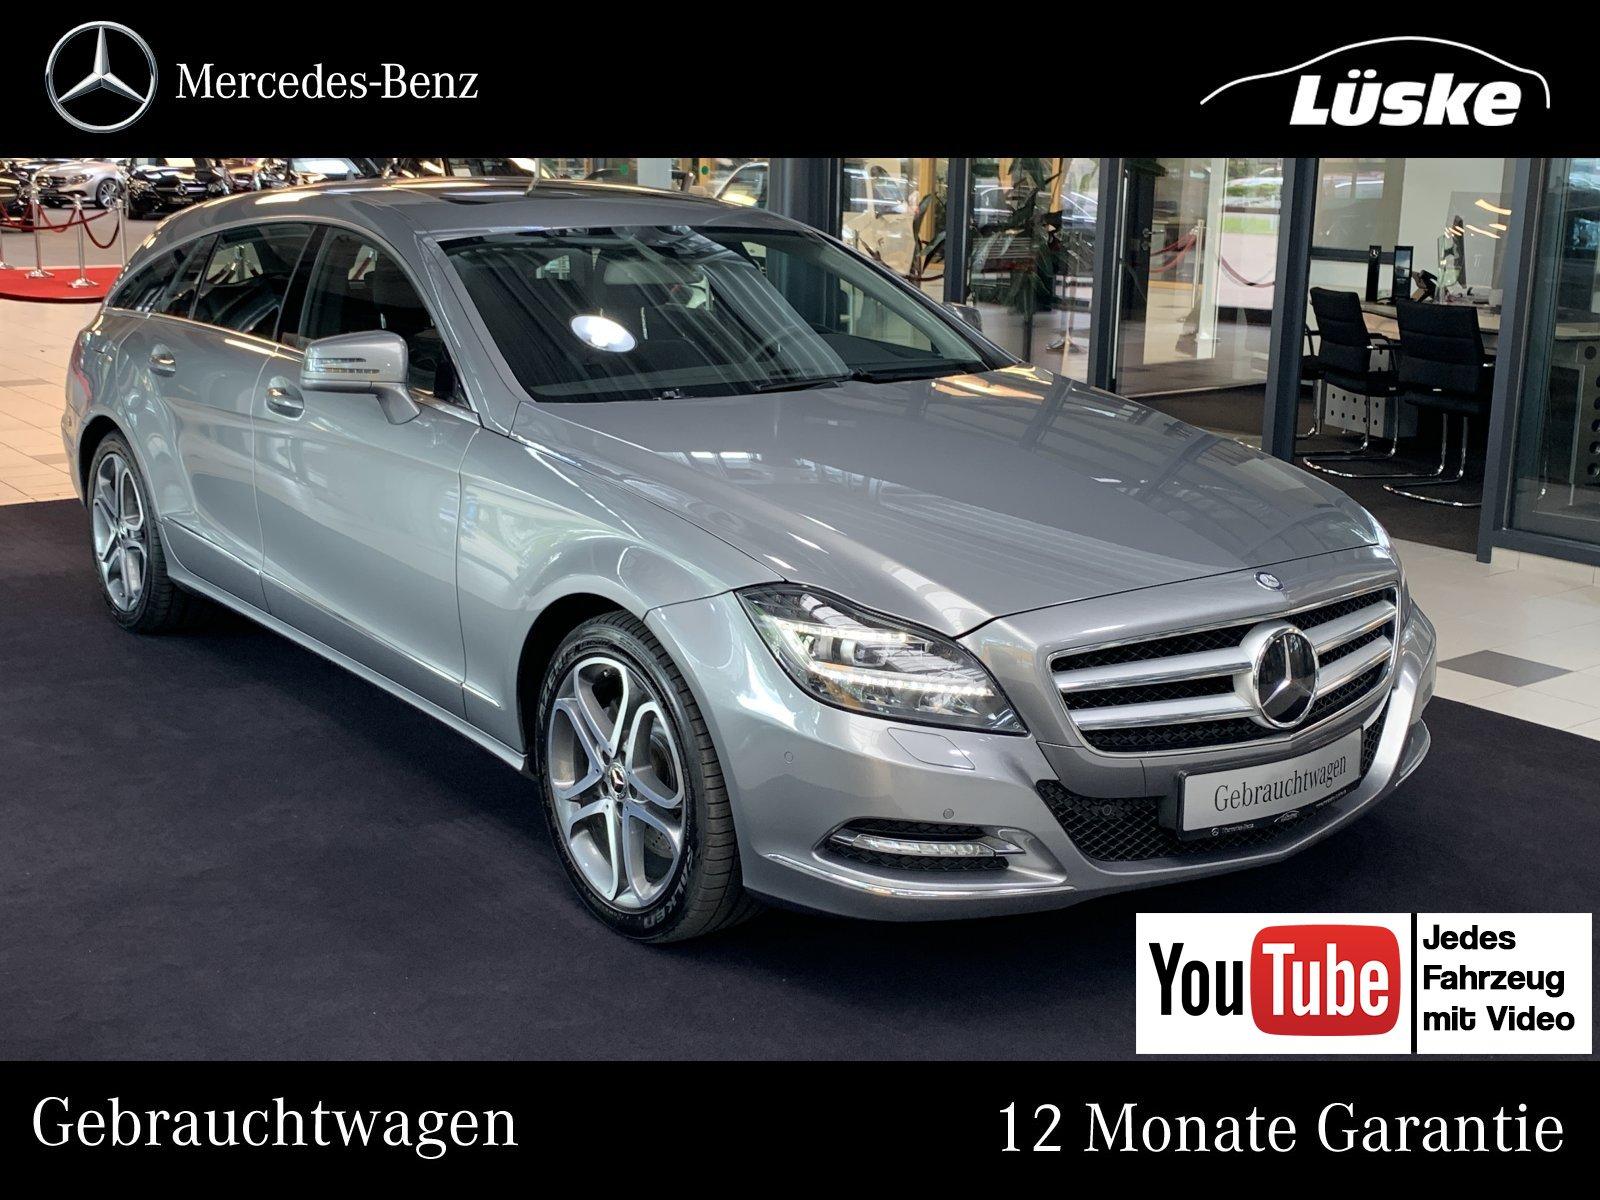 Mercedes-Benz CLS 350 CDI 4M SB Sport Kamera Harman AHK Distro, Jahr 2014, Diesel